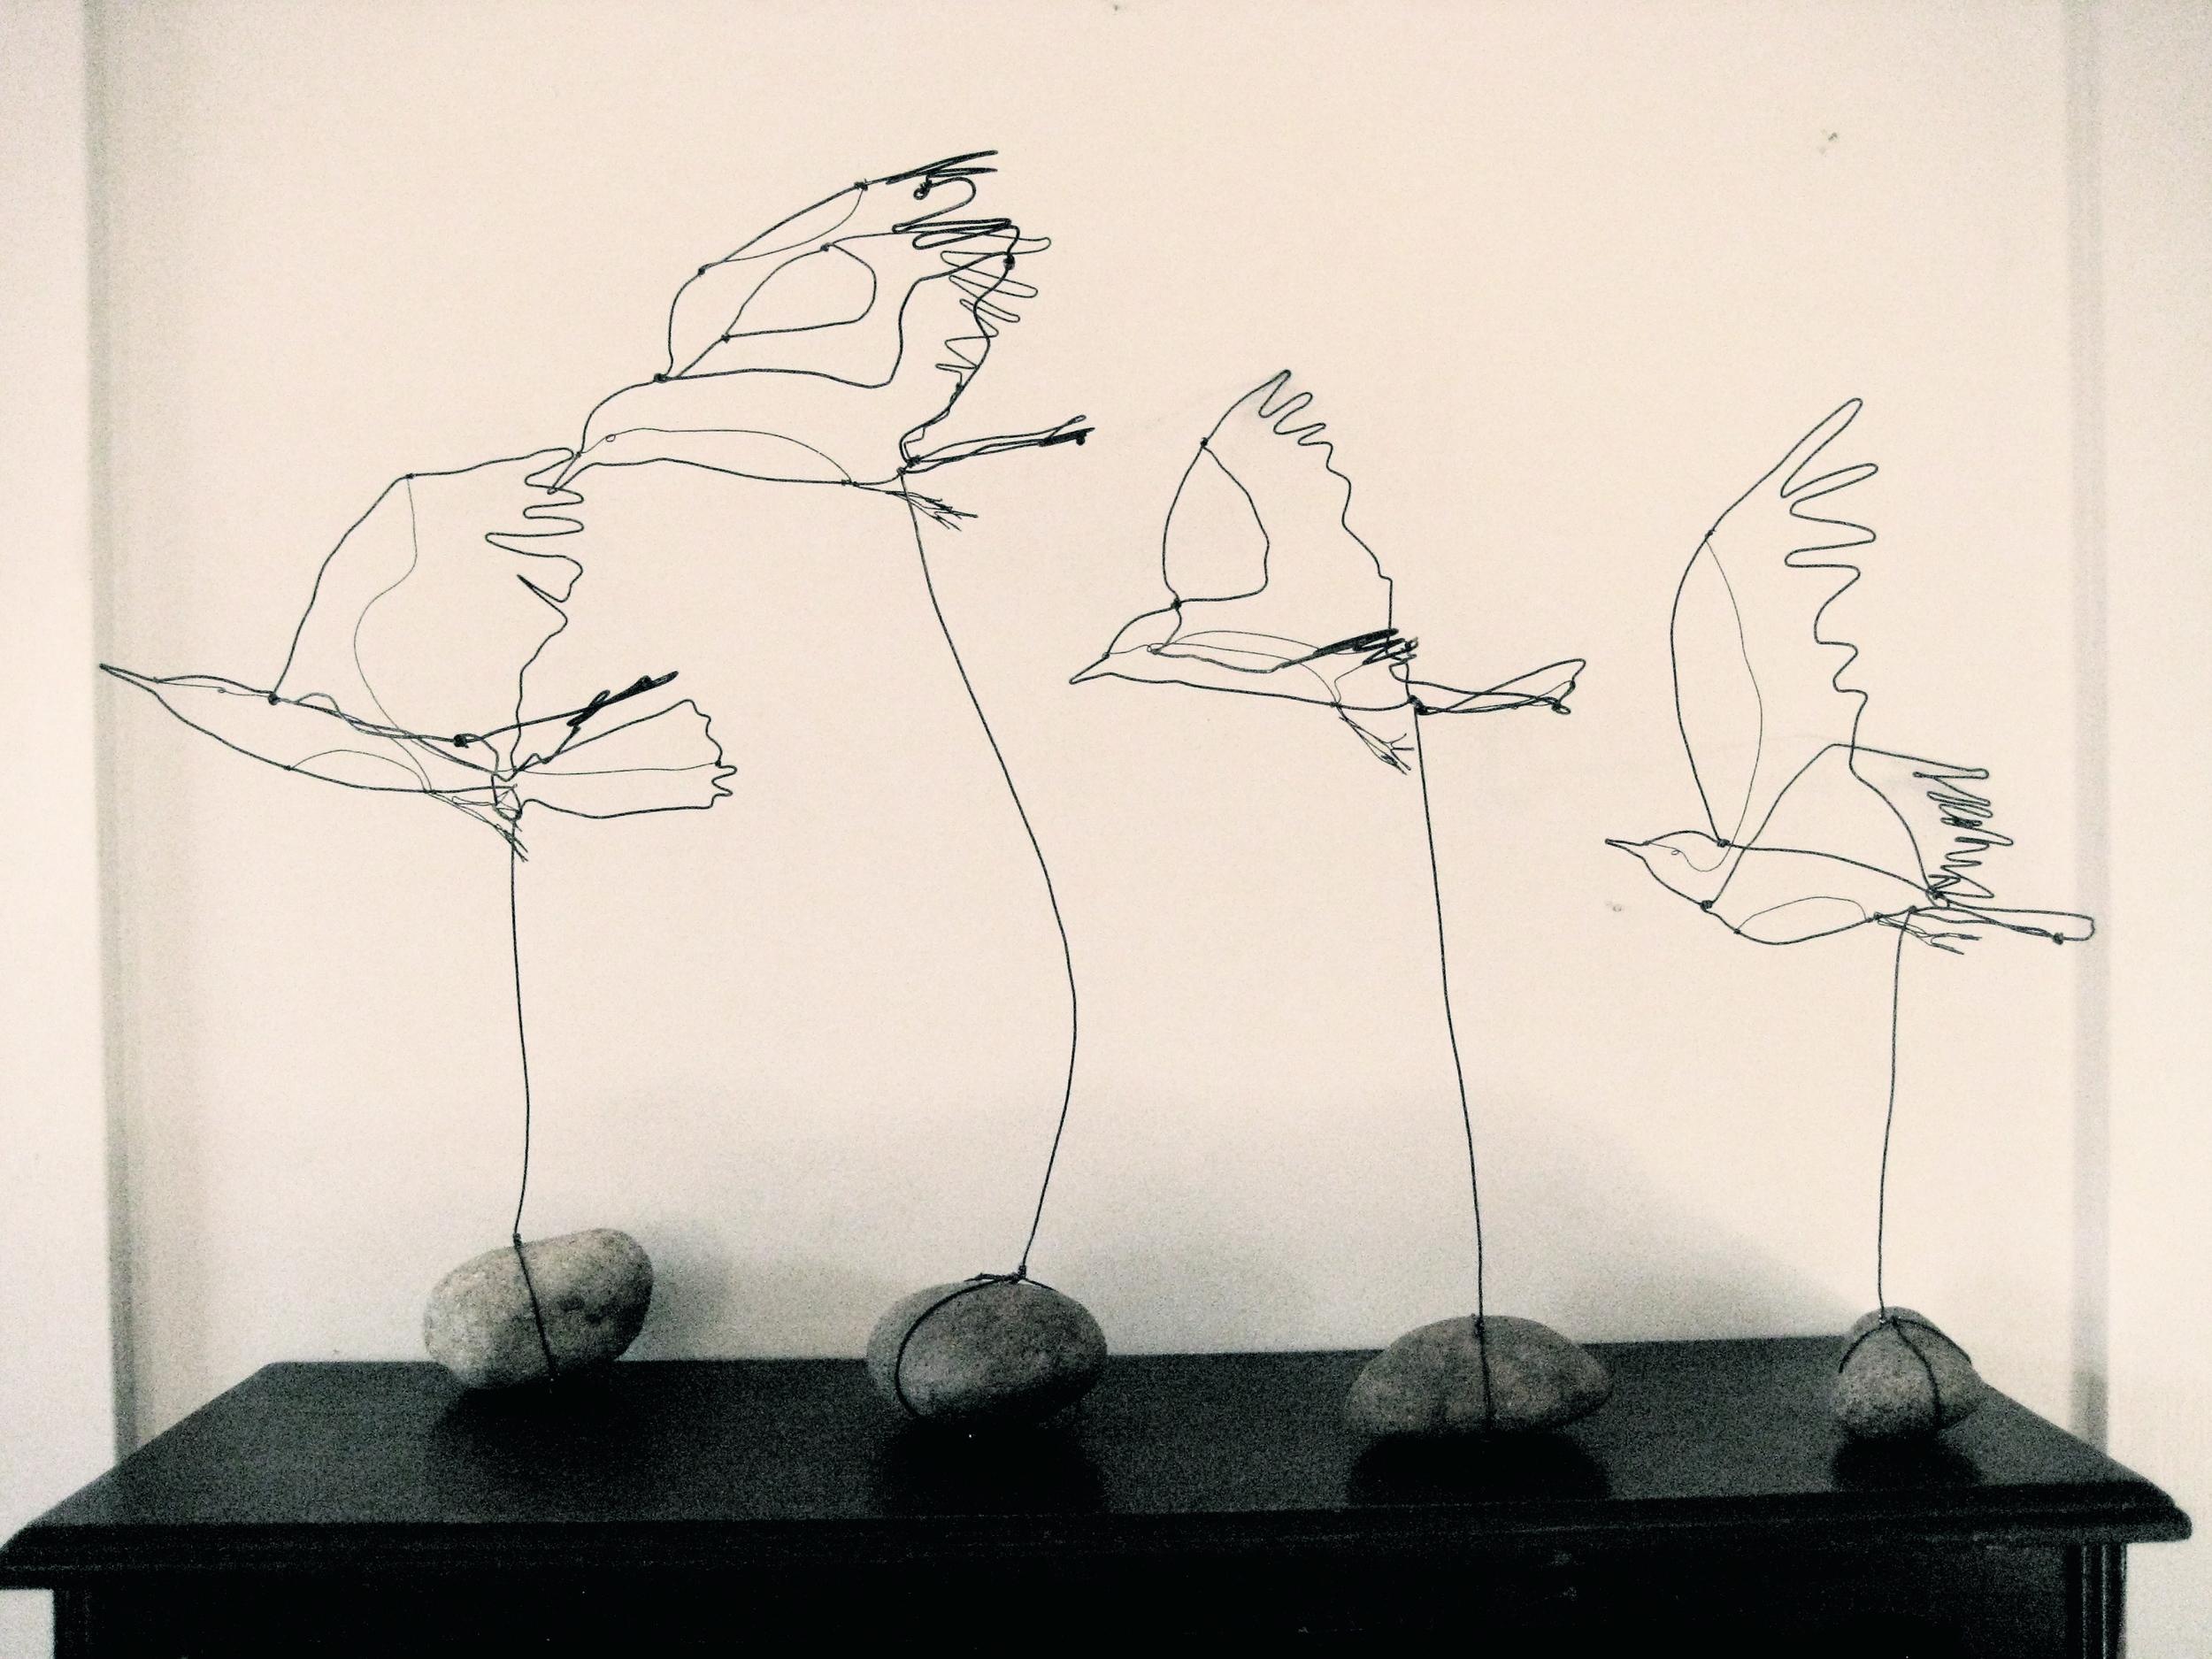 Wire birds on rocks